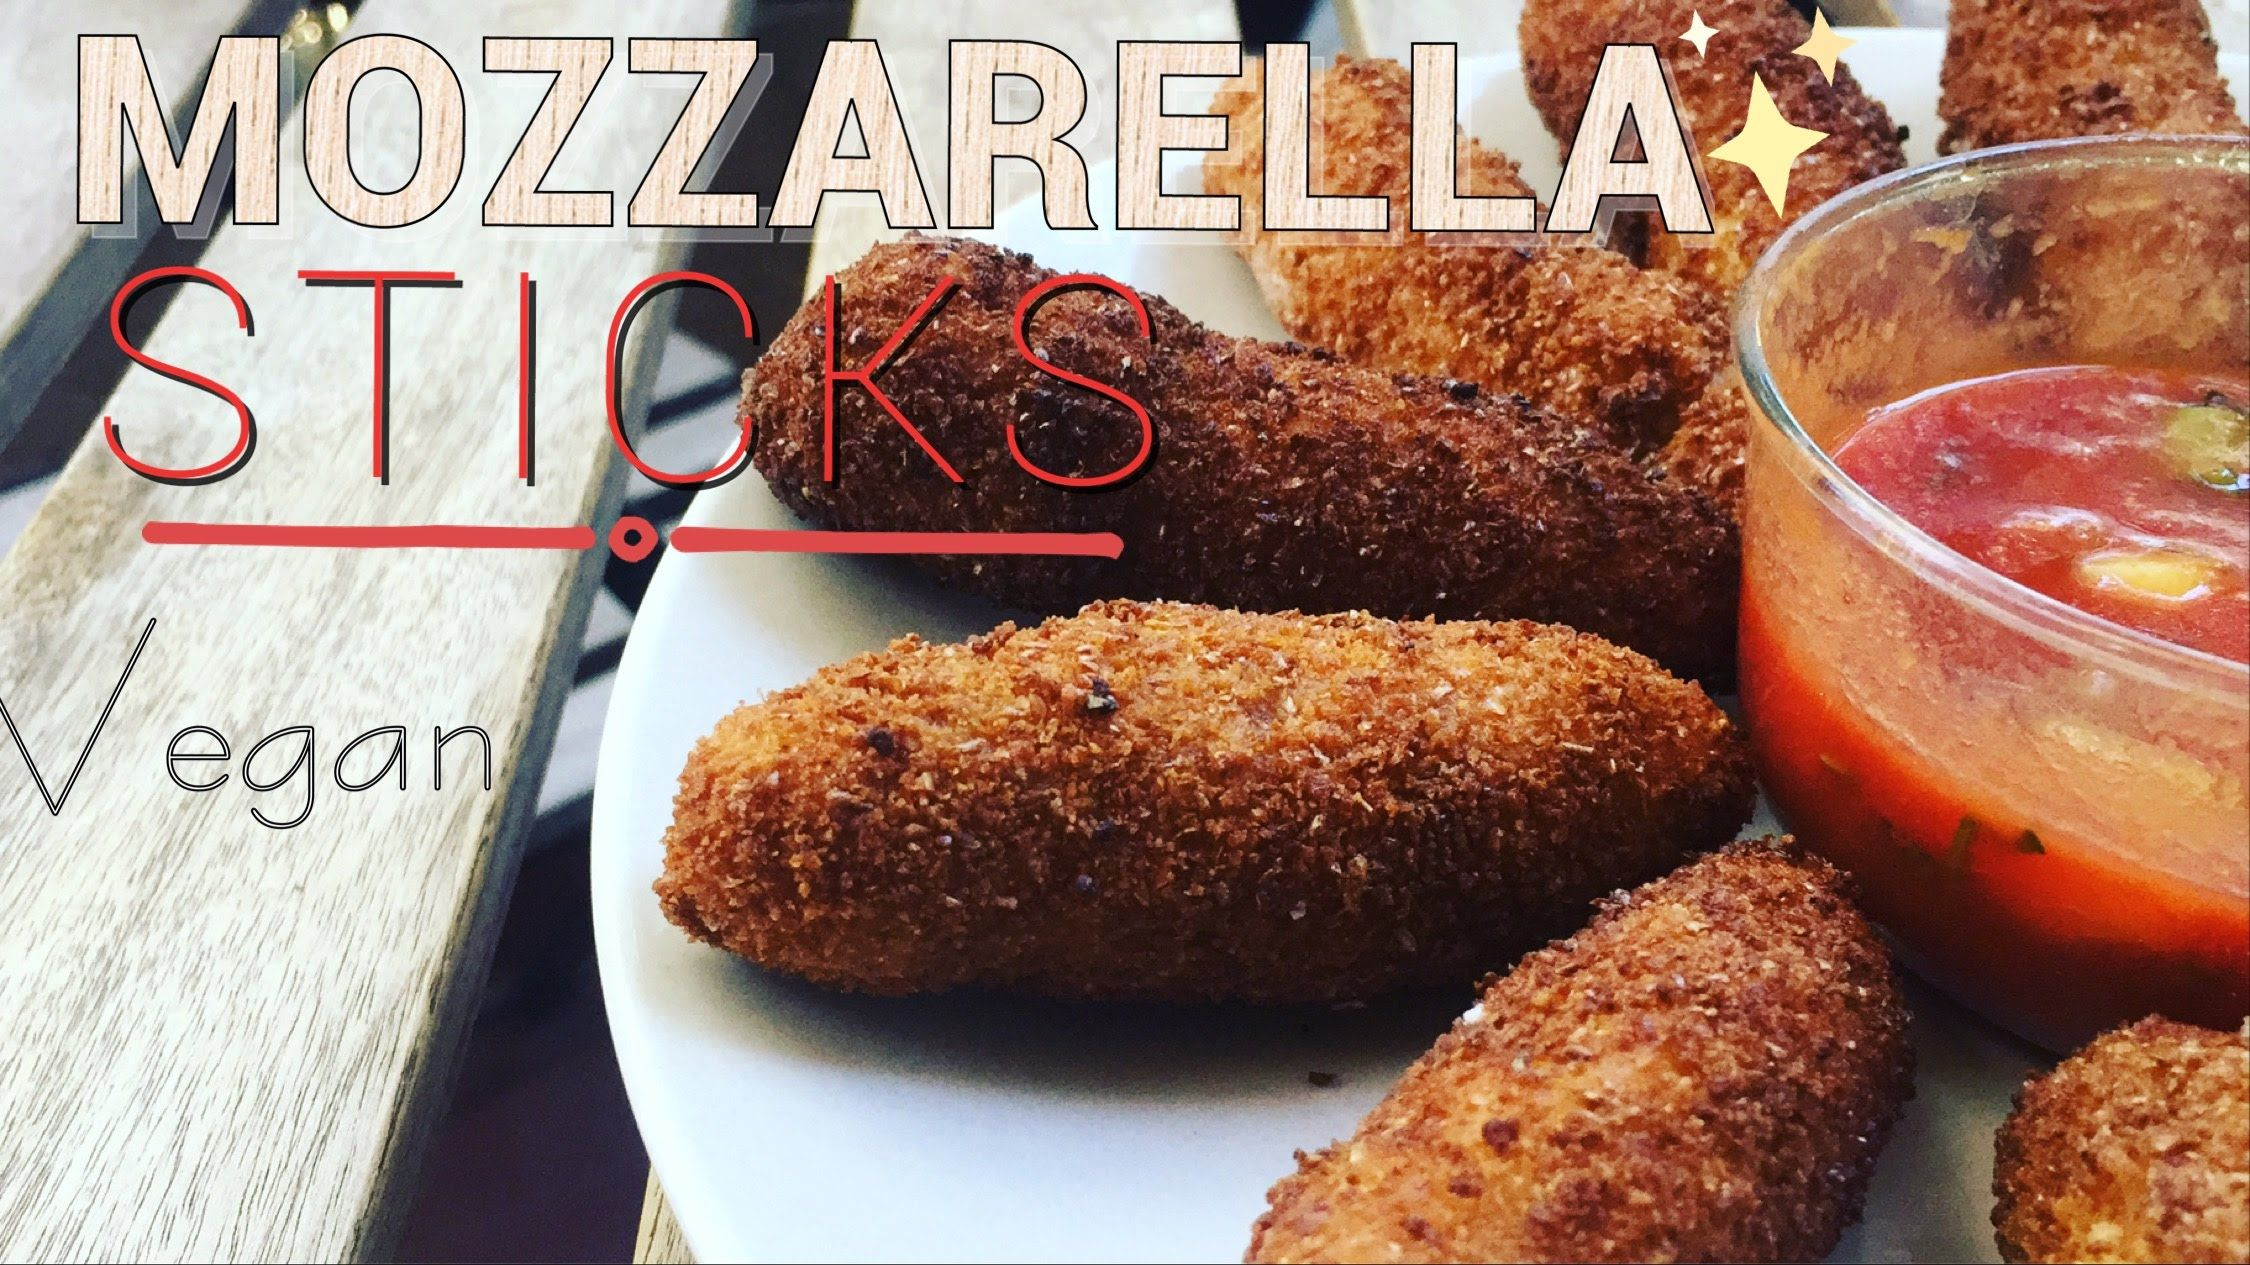 MOZZARELLA STICKS | RECETTE VEGETALE